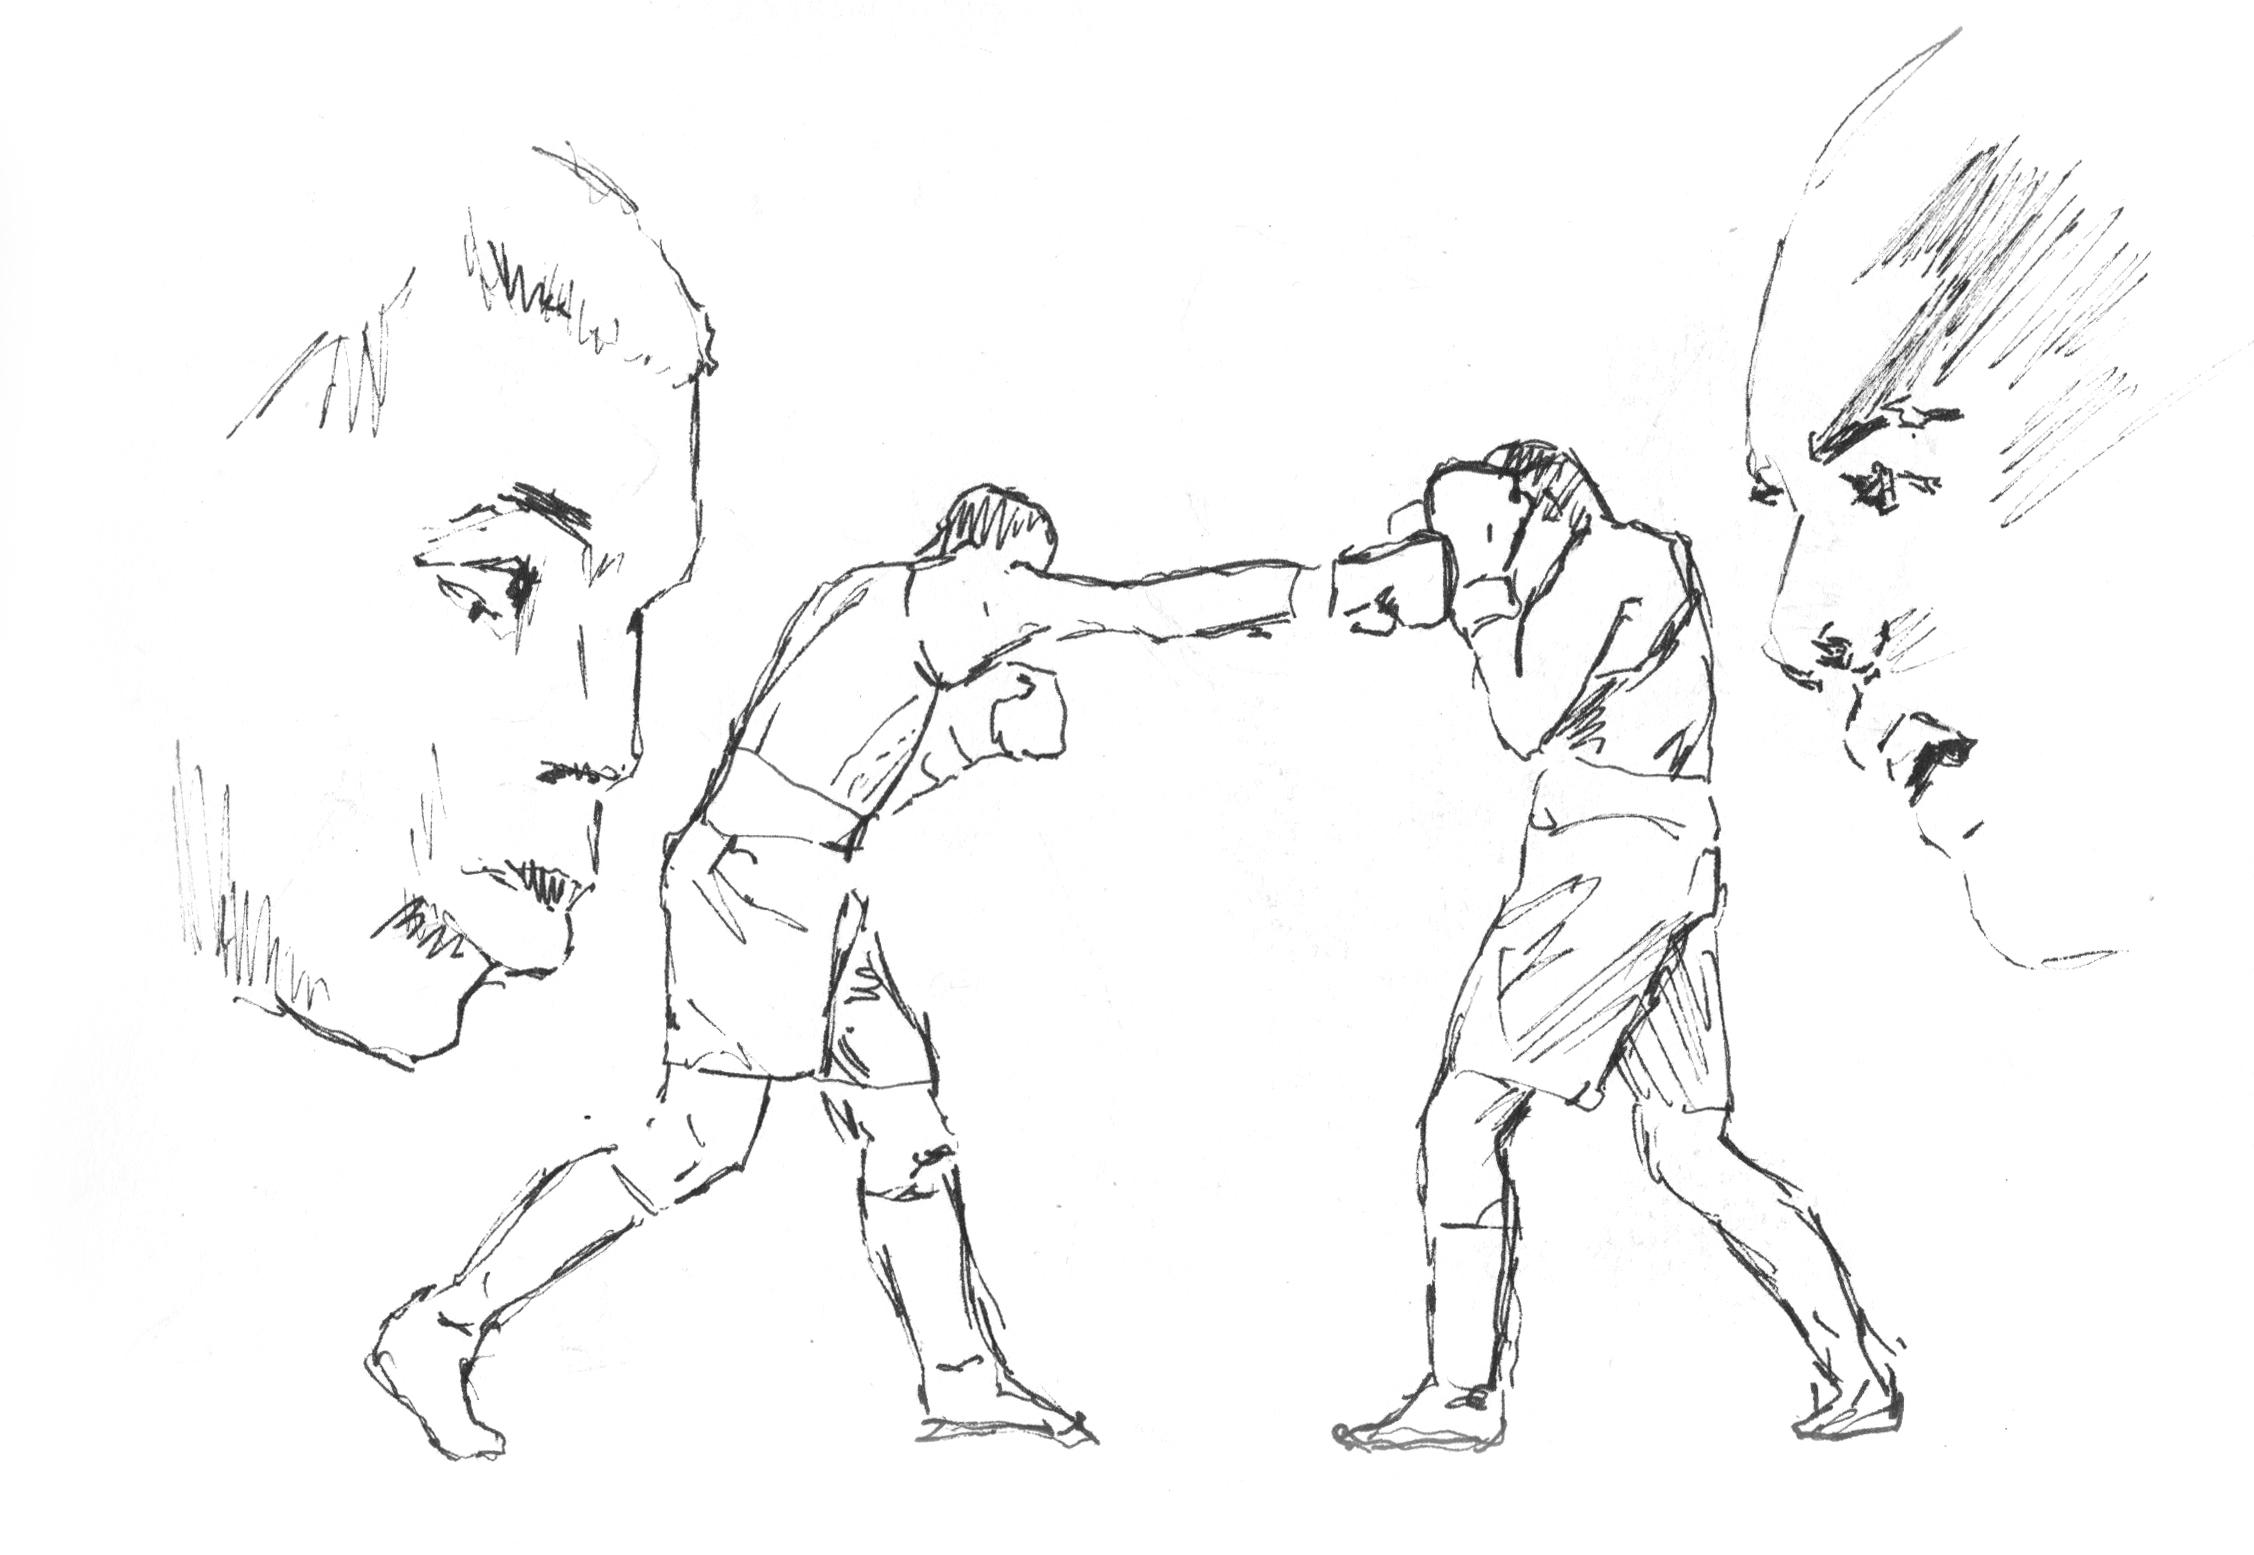 Boxer 4 / 2018 / Filzstift auf Papier / 14 x 30 cm